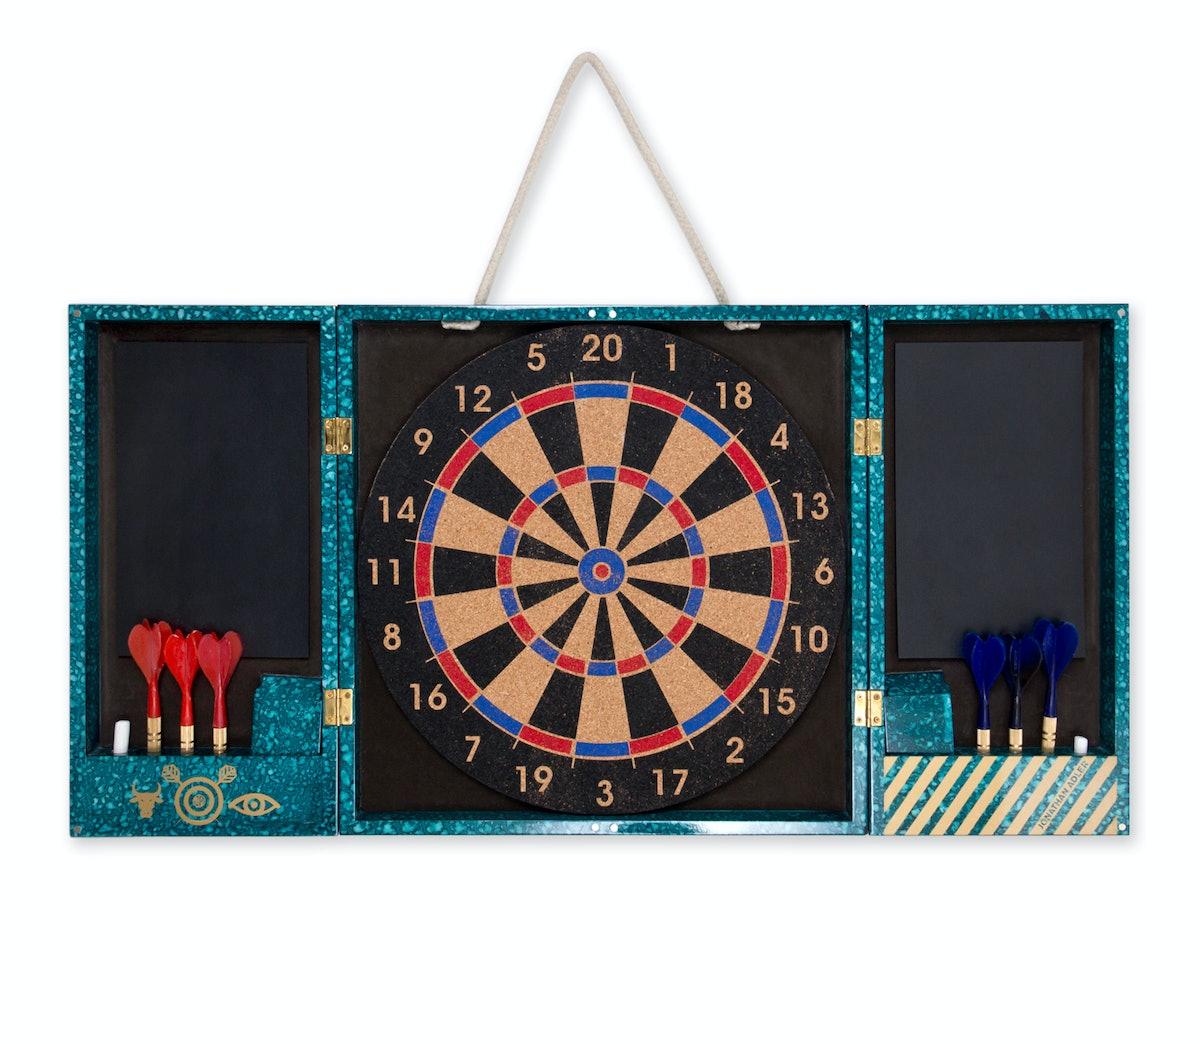 Jonathan Adler dartboard set